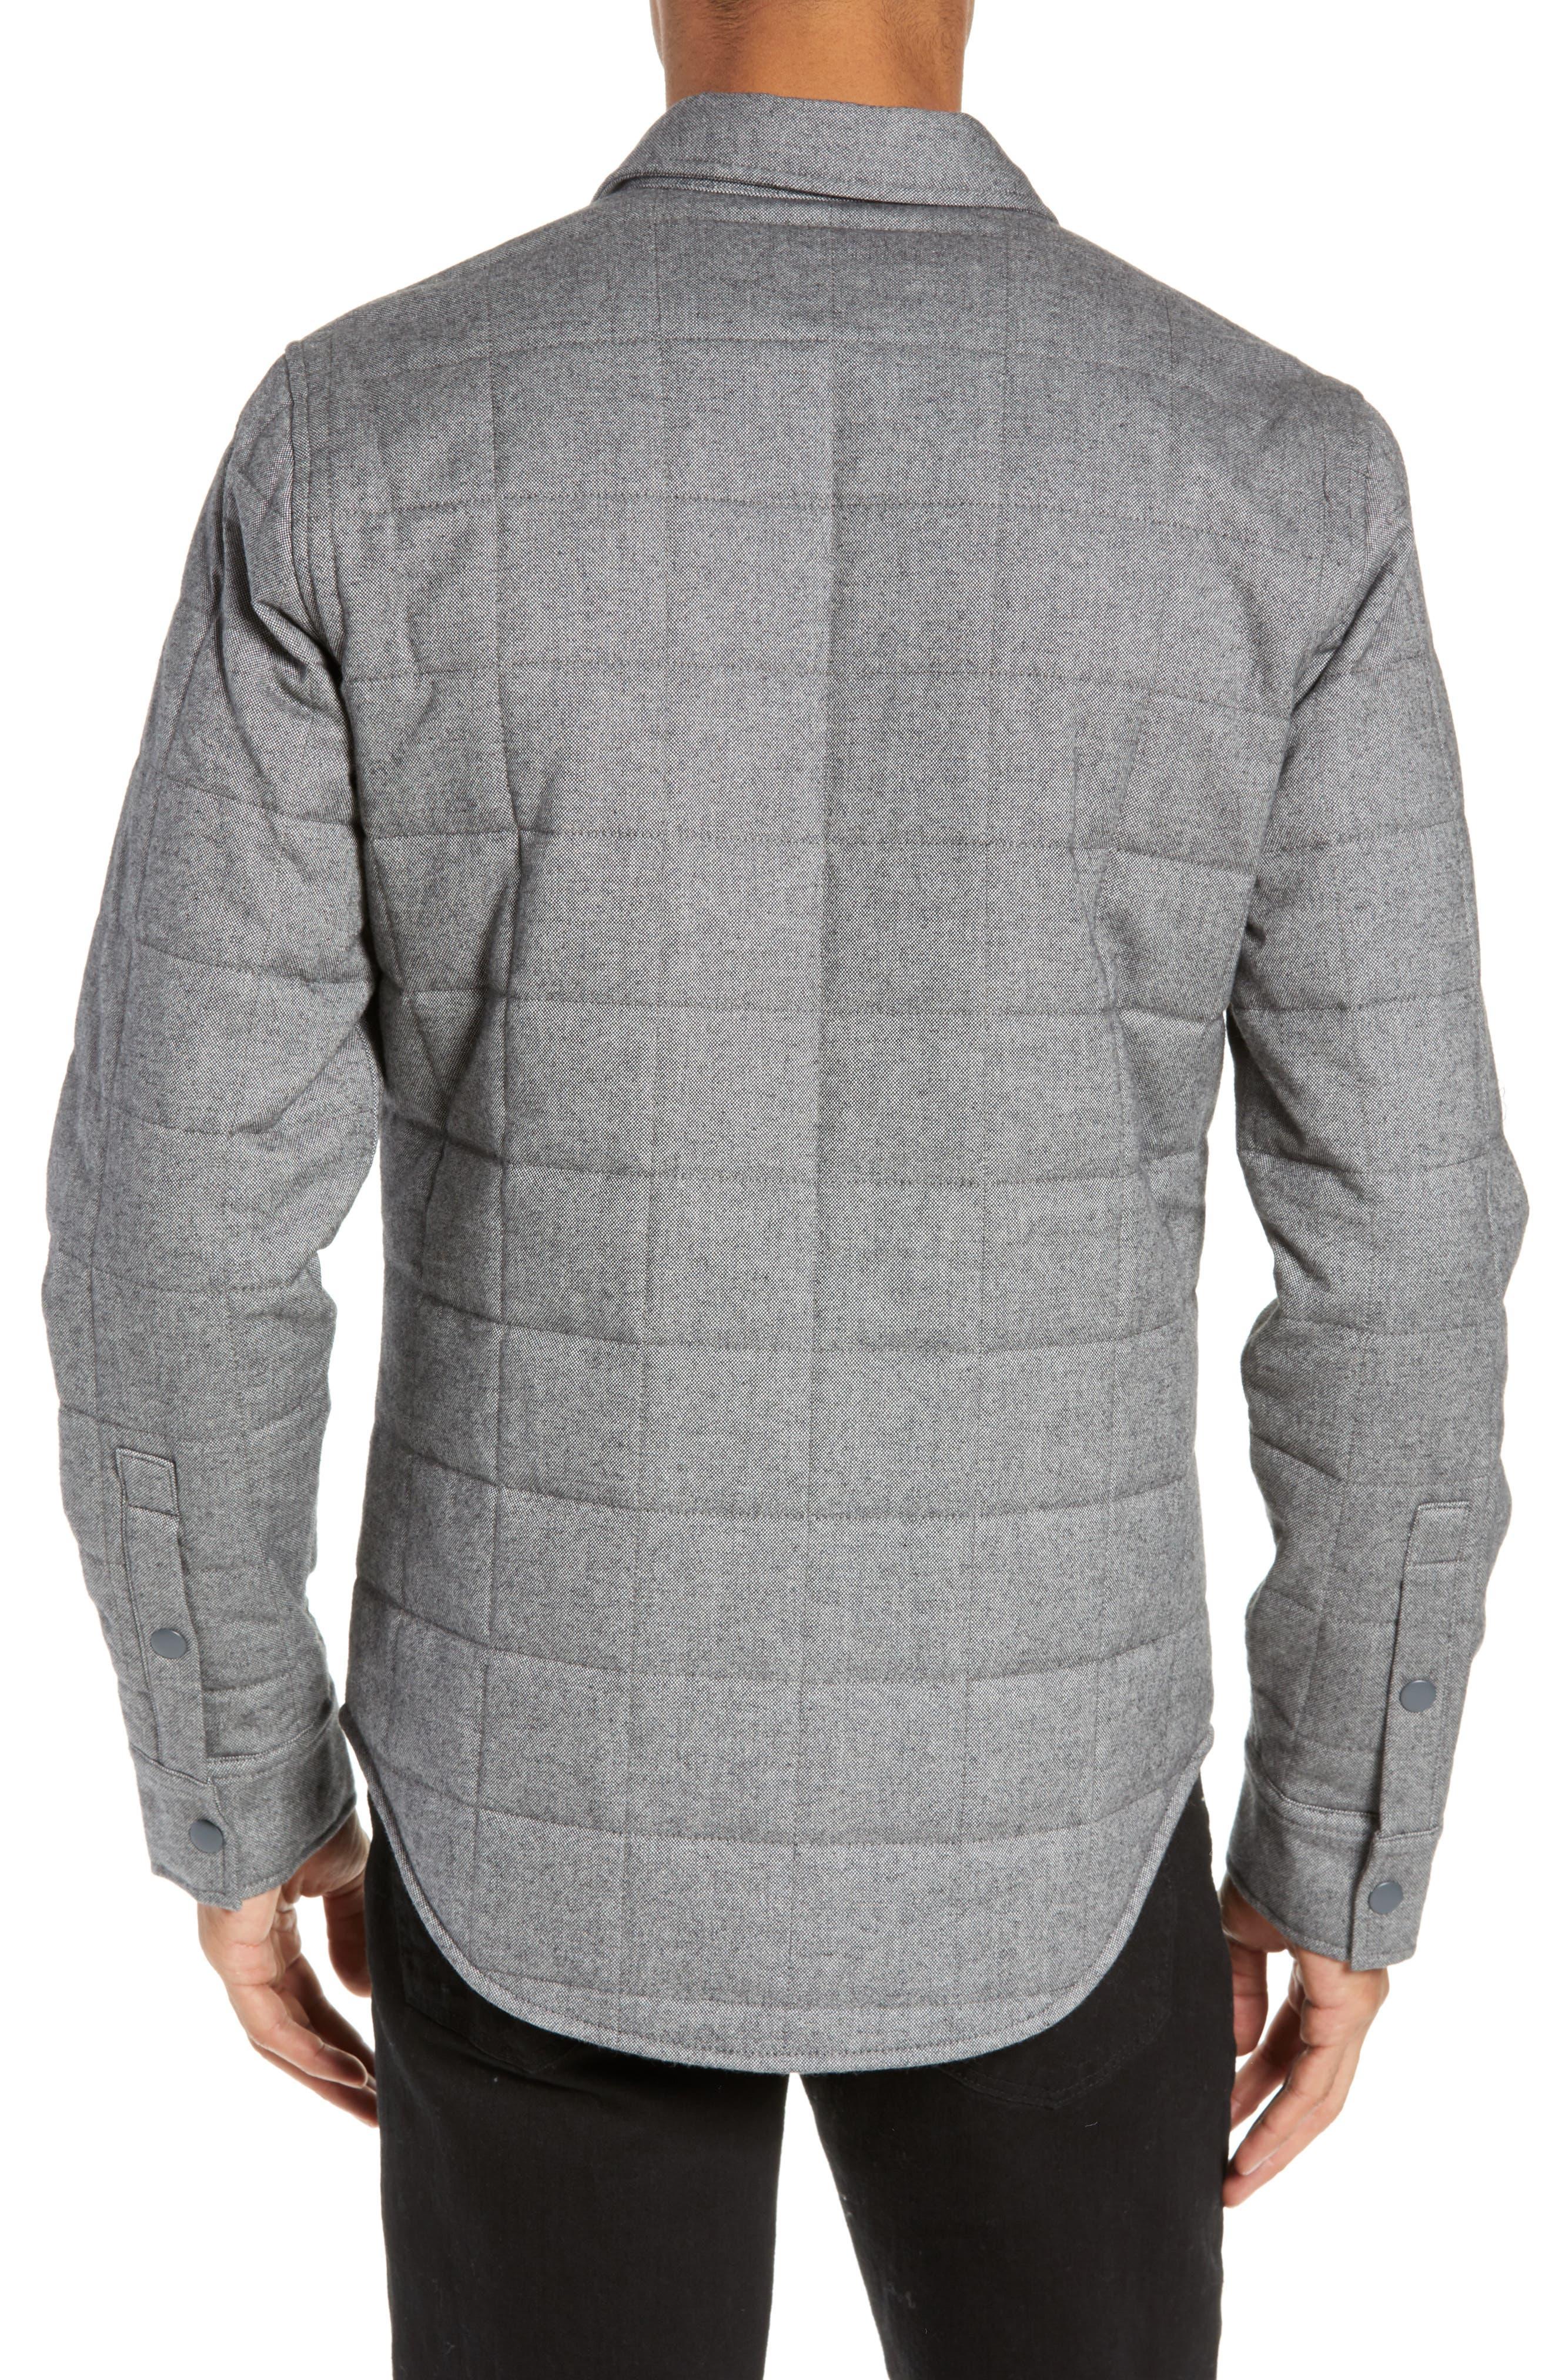 Quilted Herringbone Shirt Jacket,                             Alternate thumbnail 2, color,                             GREY COTTON HERRINGBONE